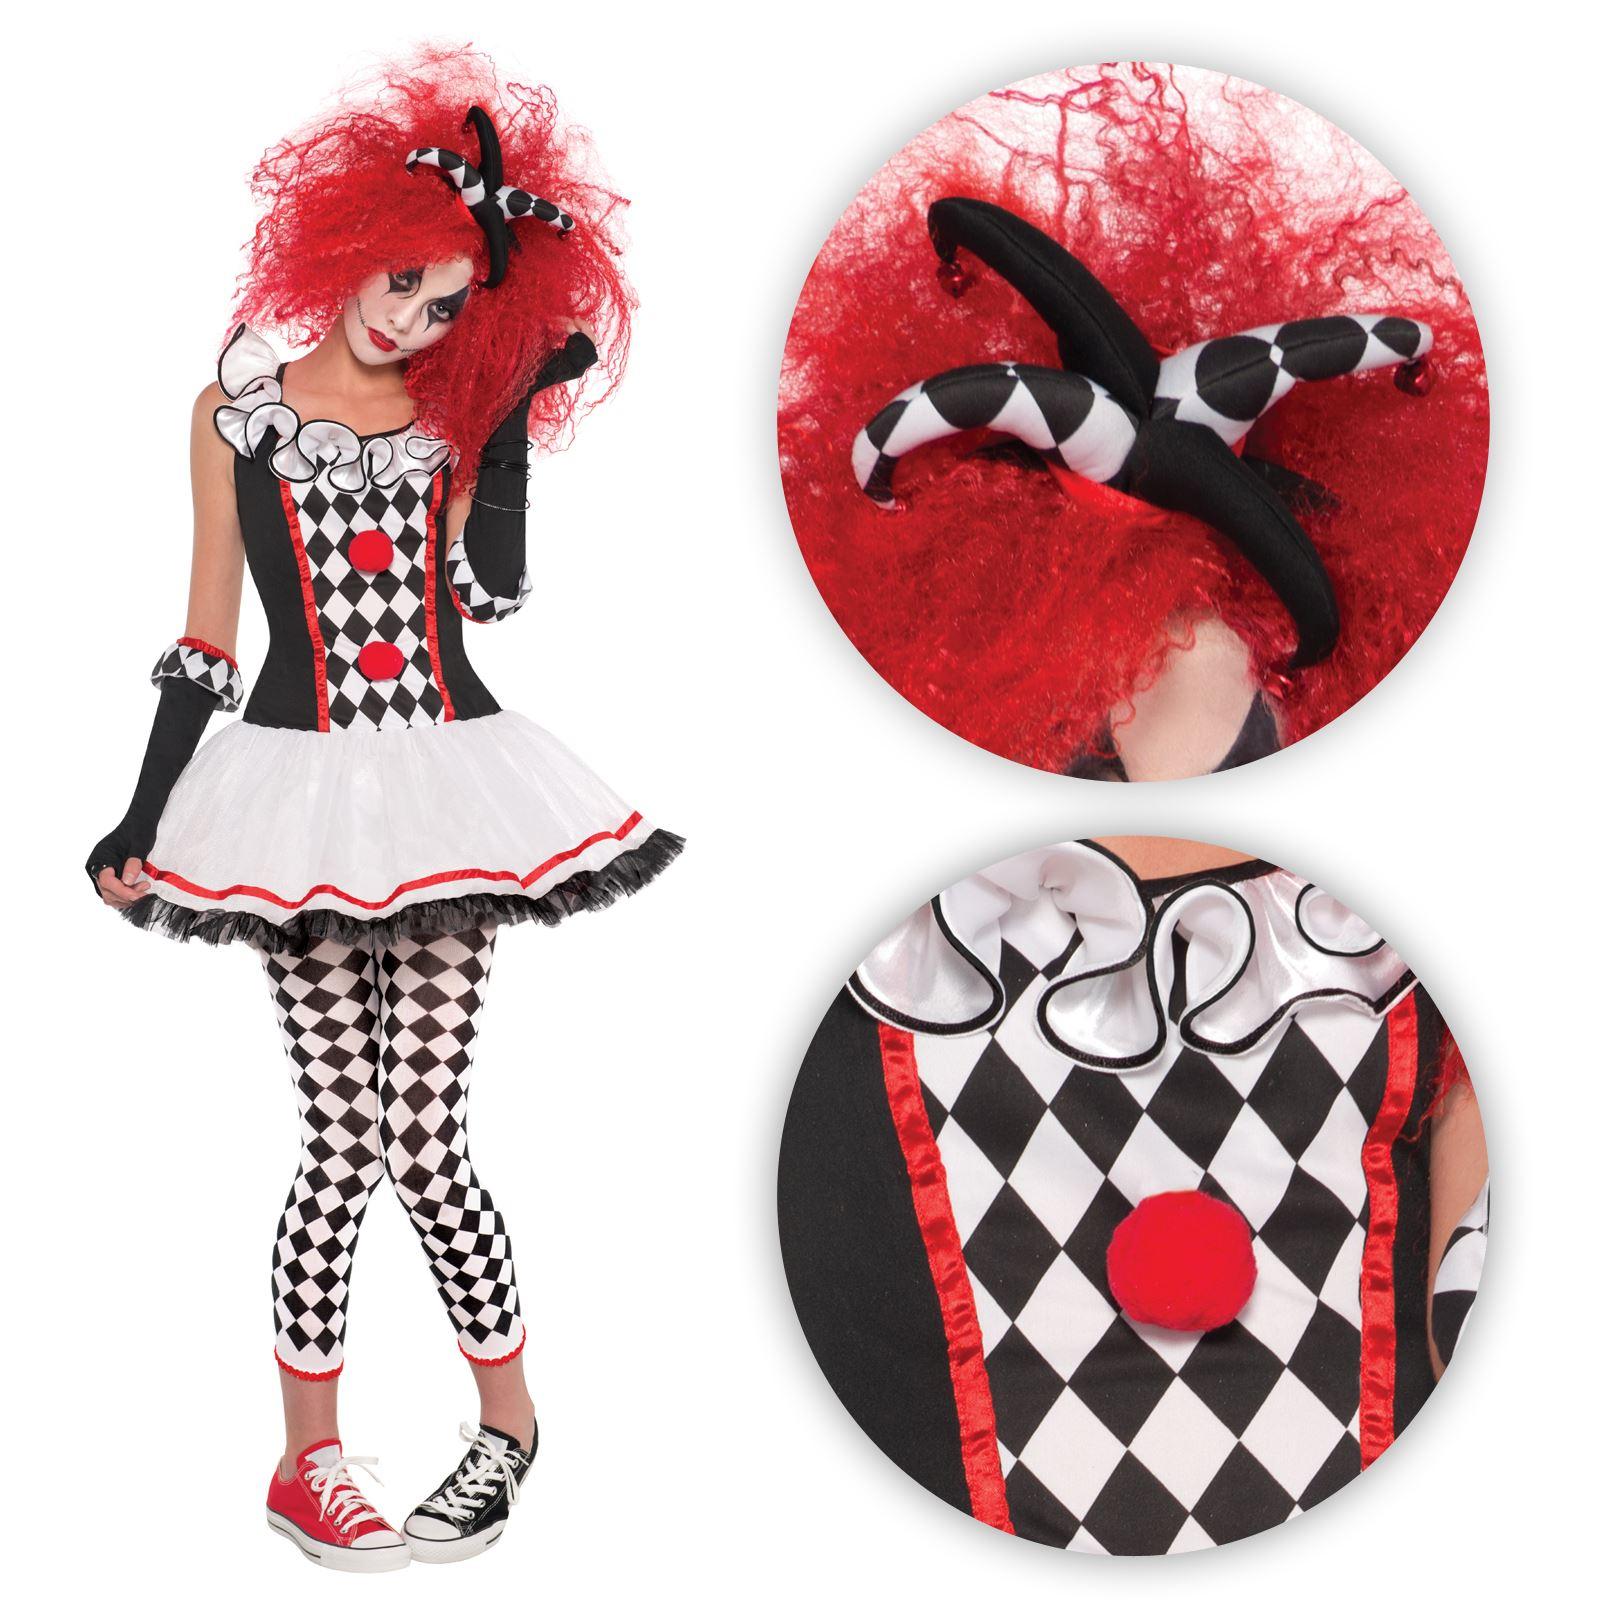 Harlequin Tights NOIR//BLANC Médiéval Bouffon Clown Fancy Dress